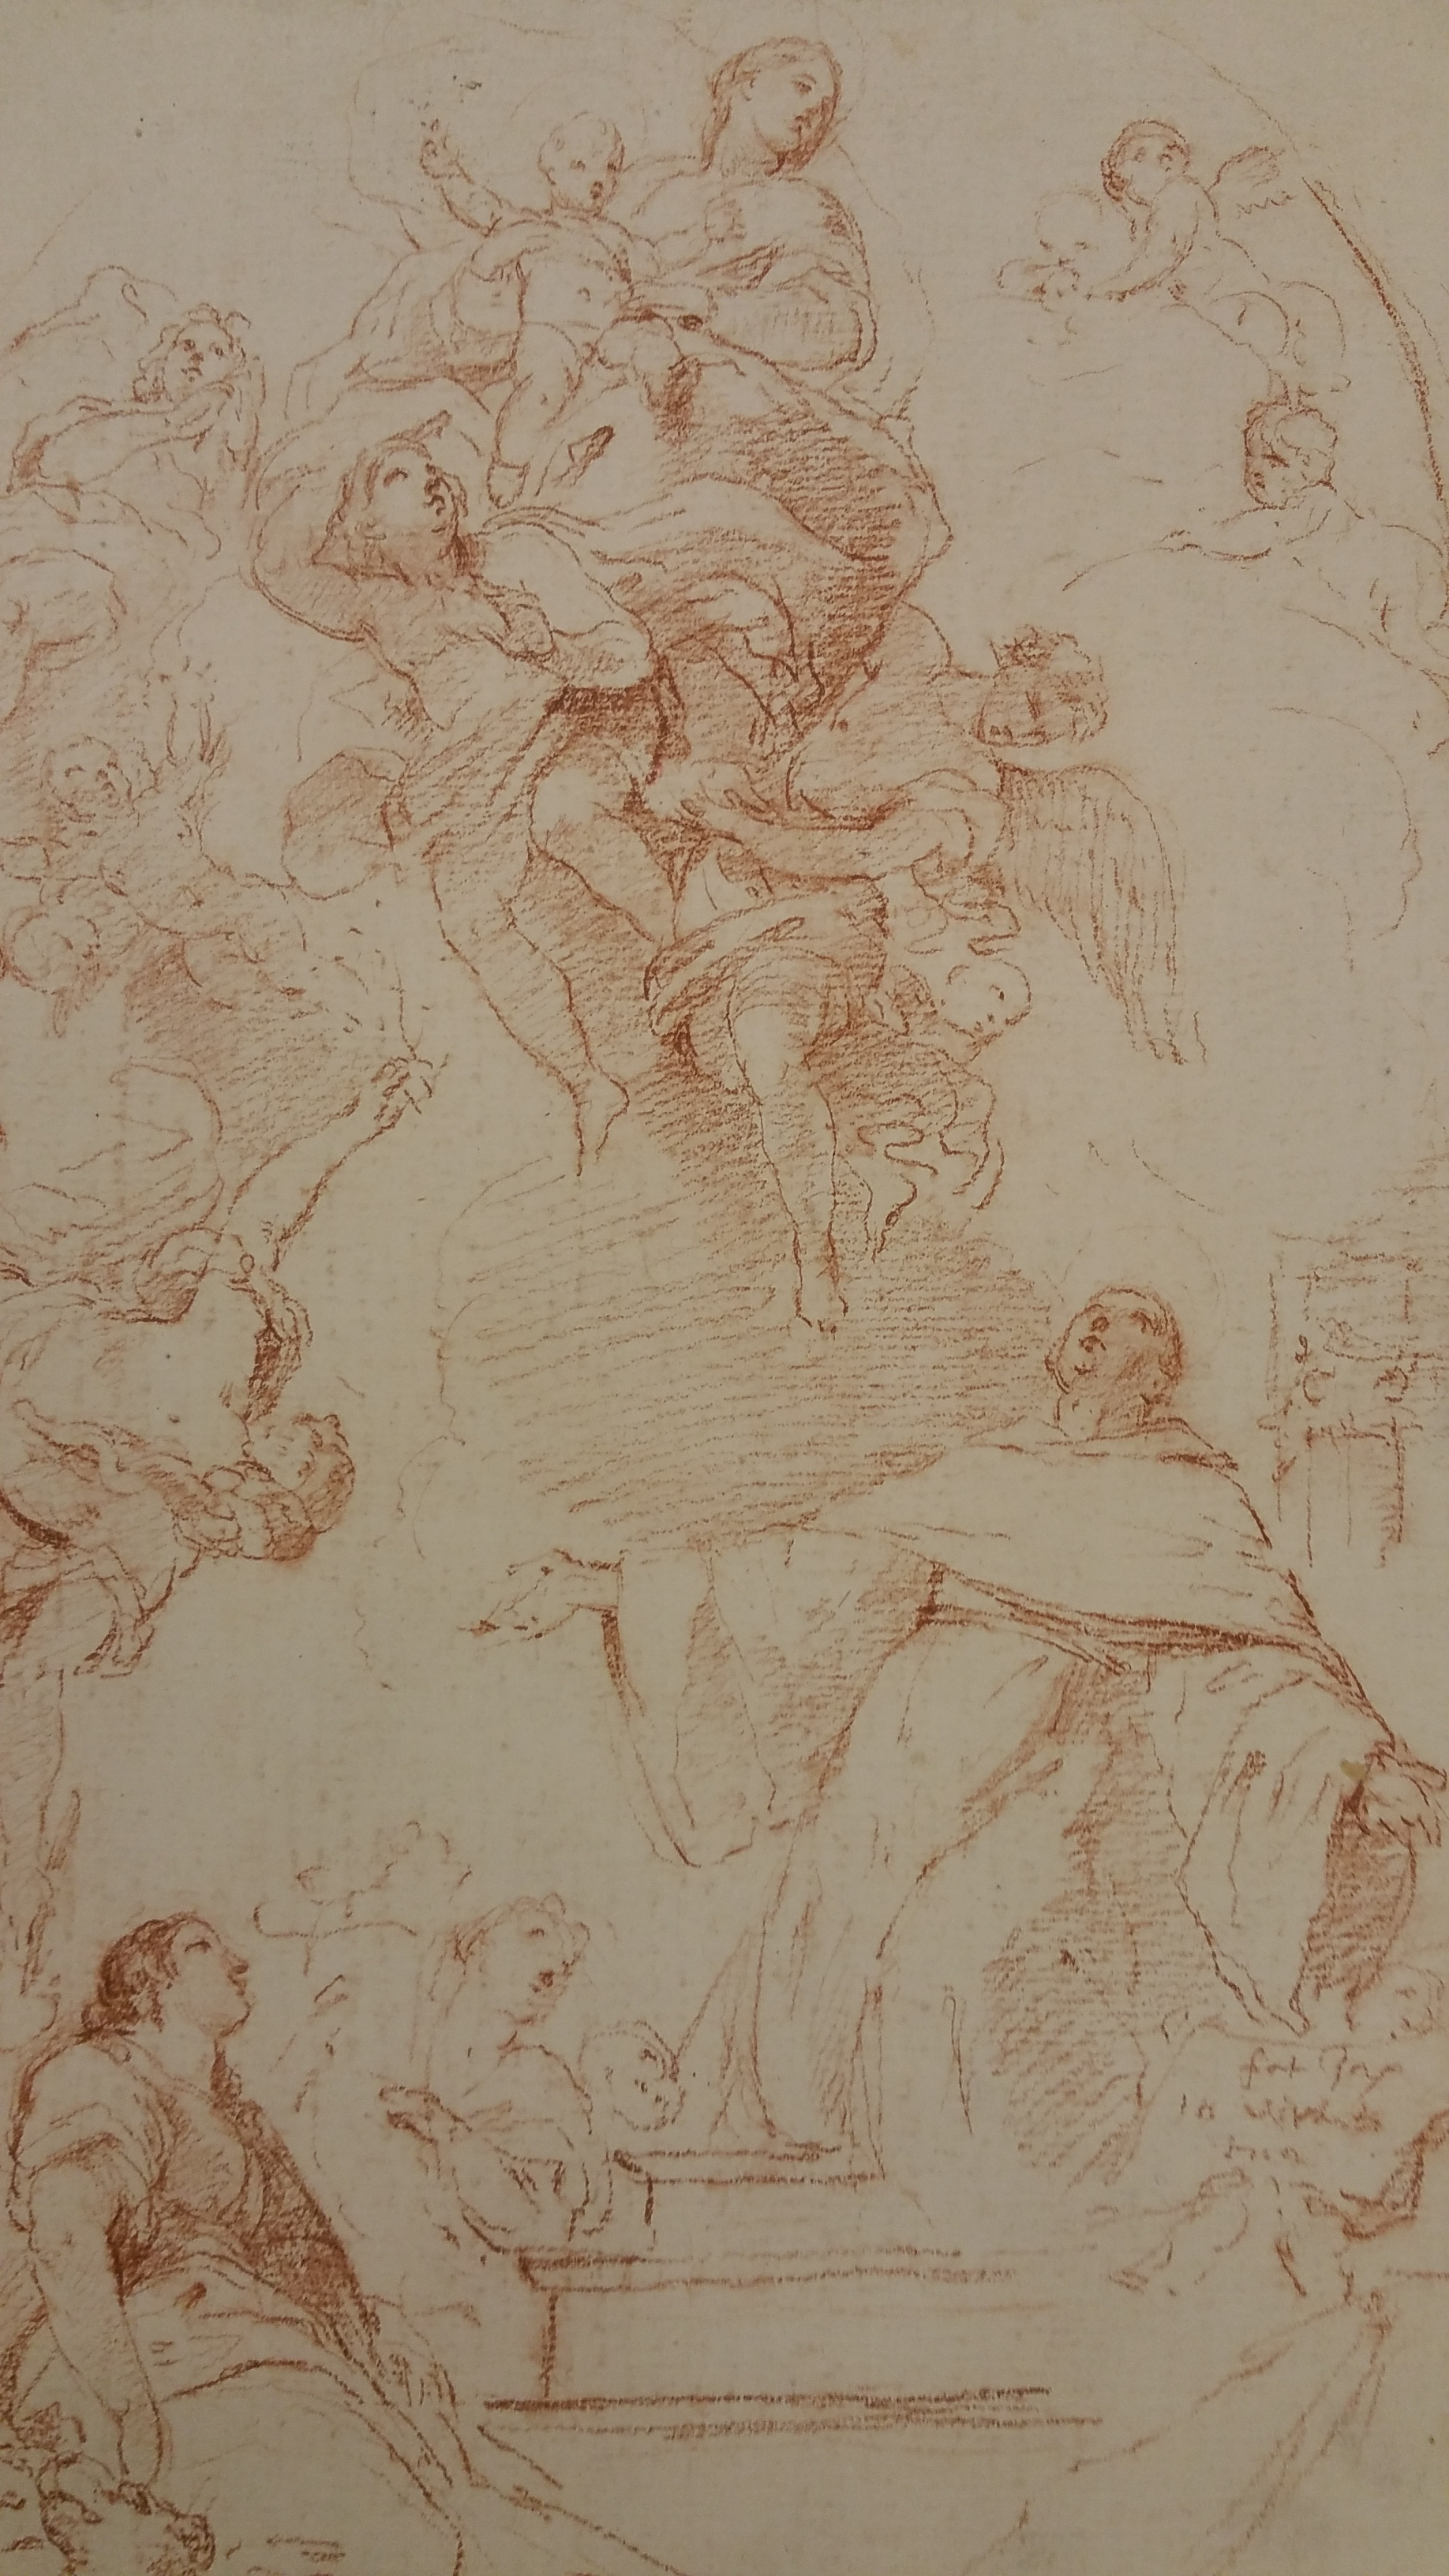 Charles-Joseph Natoire,  Apparition of the Virgin and the Infant before St. Bernard